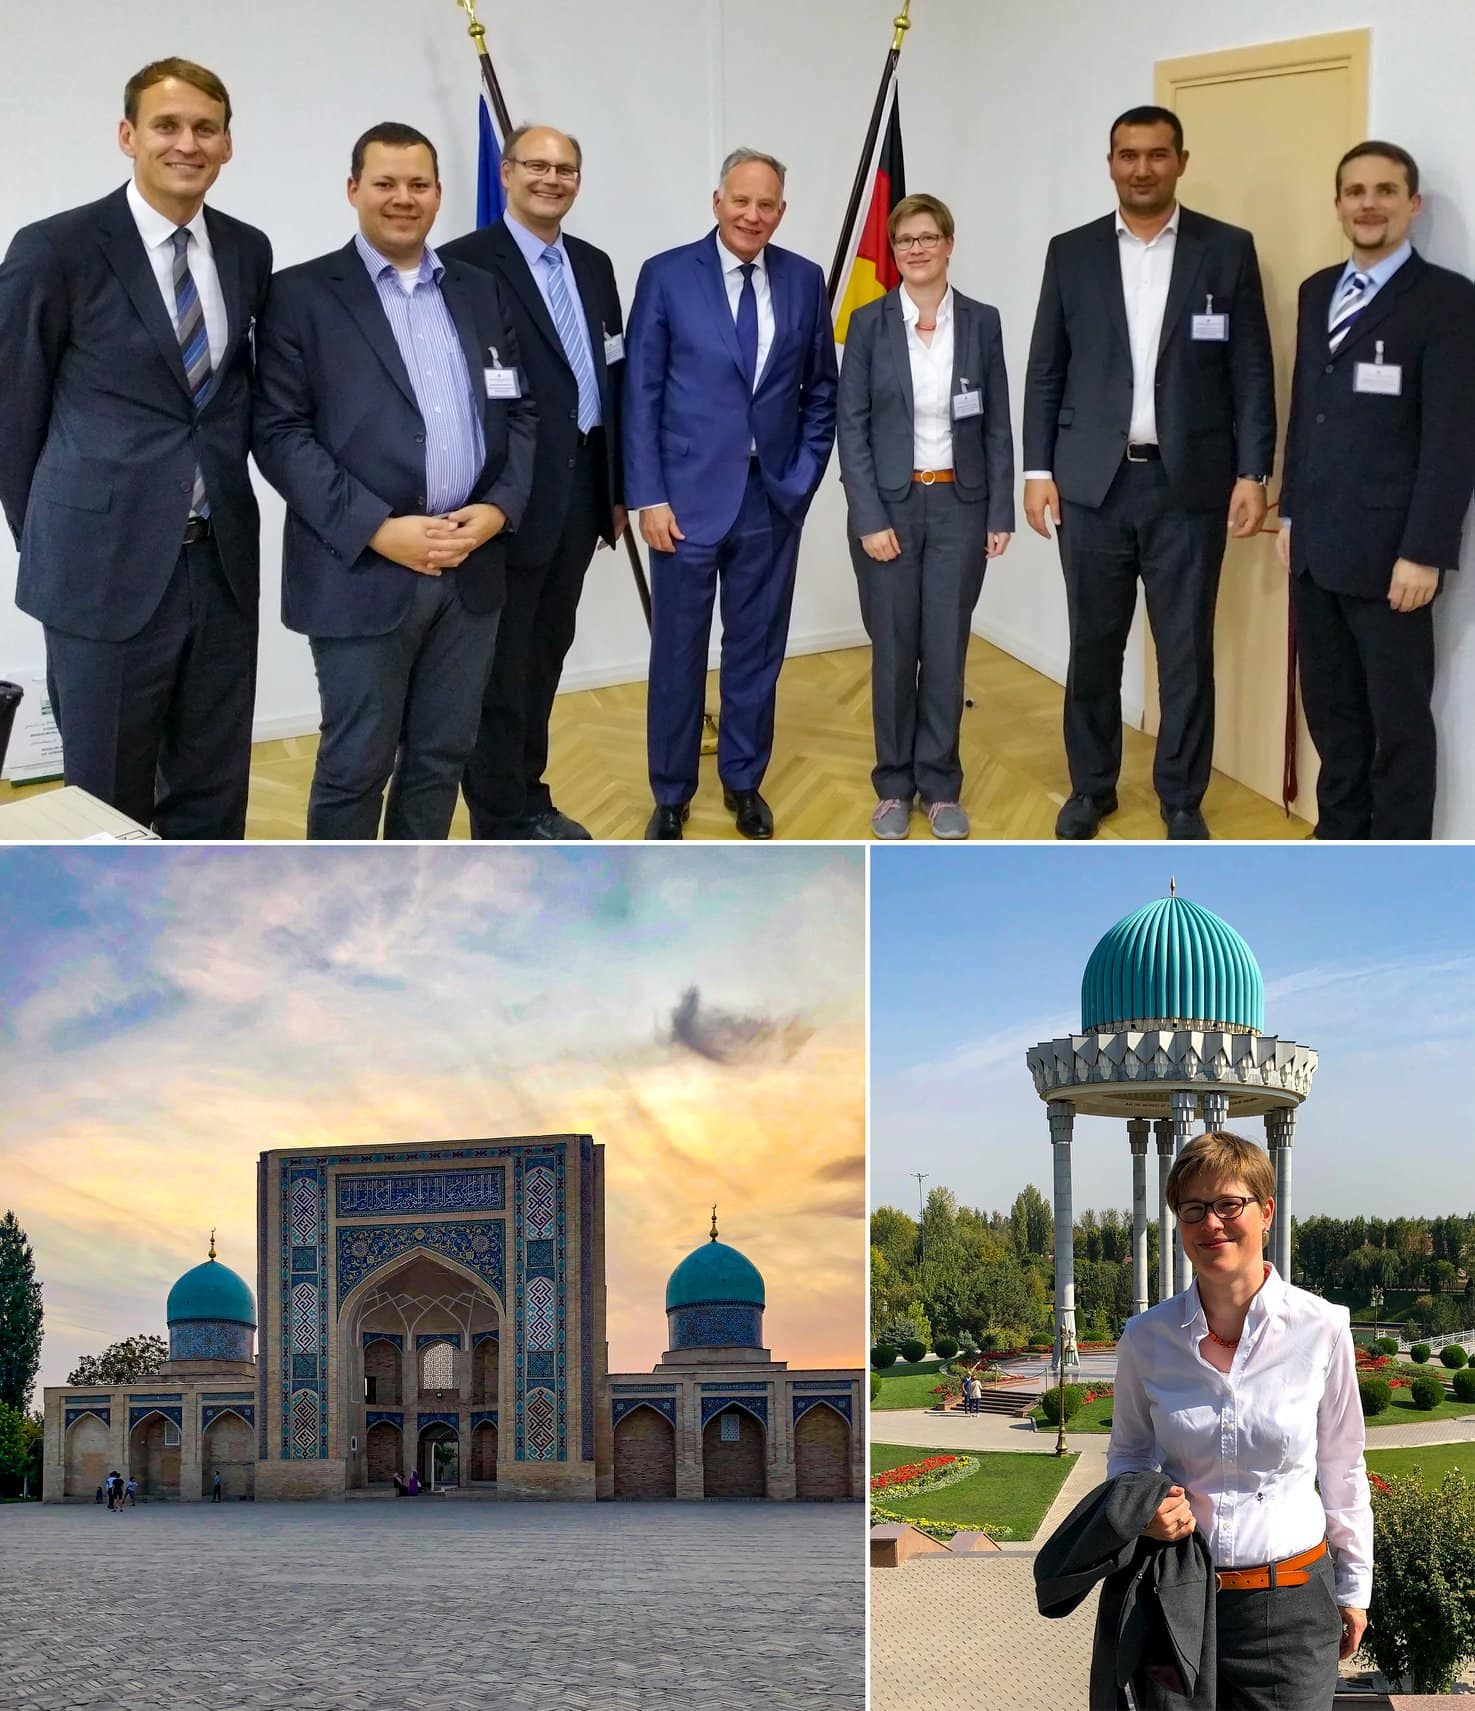 erminas CTO Dr. Yvette Teiken in Tashkent